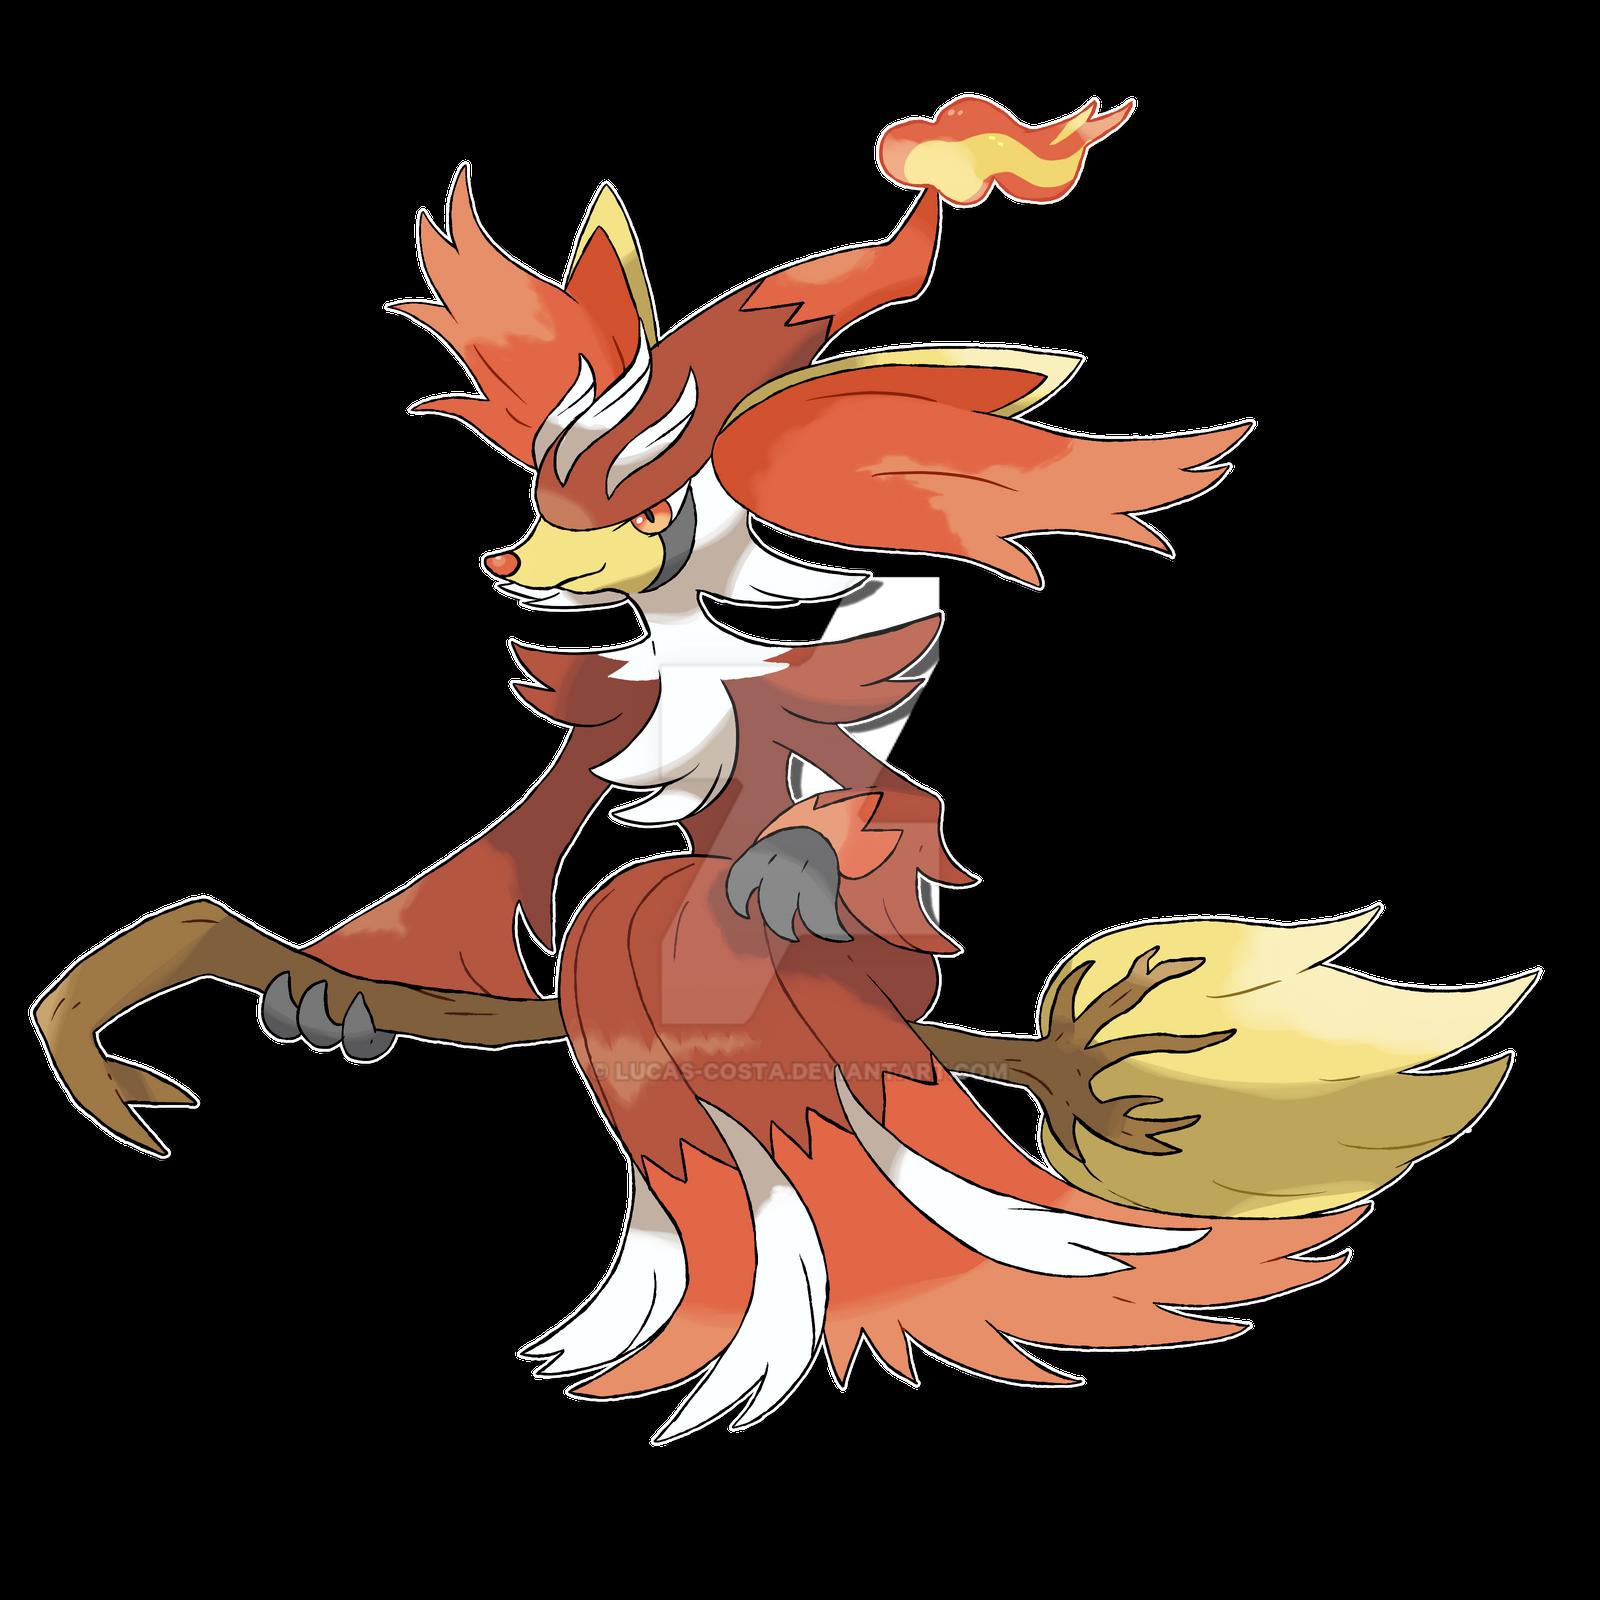 Mega Delphox Pokemon Images | Pokemon Images